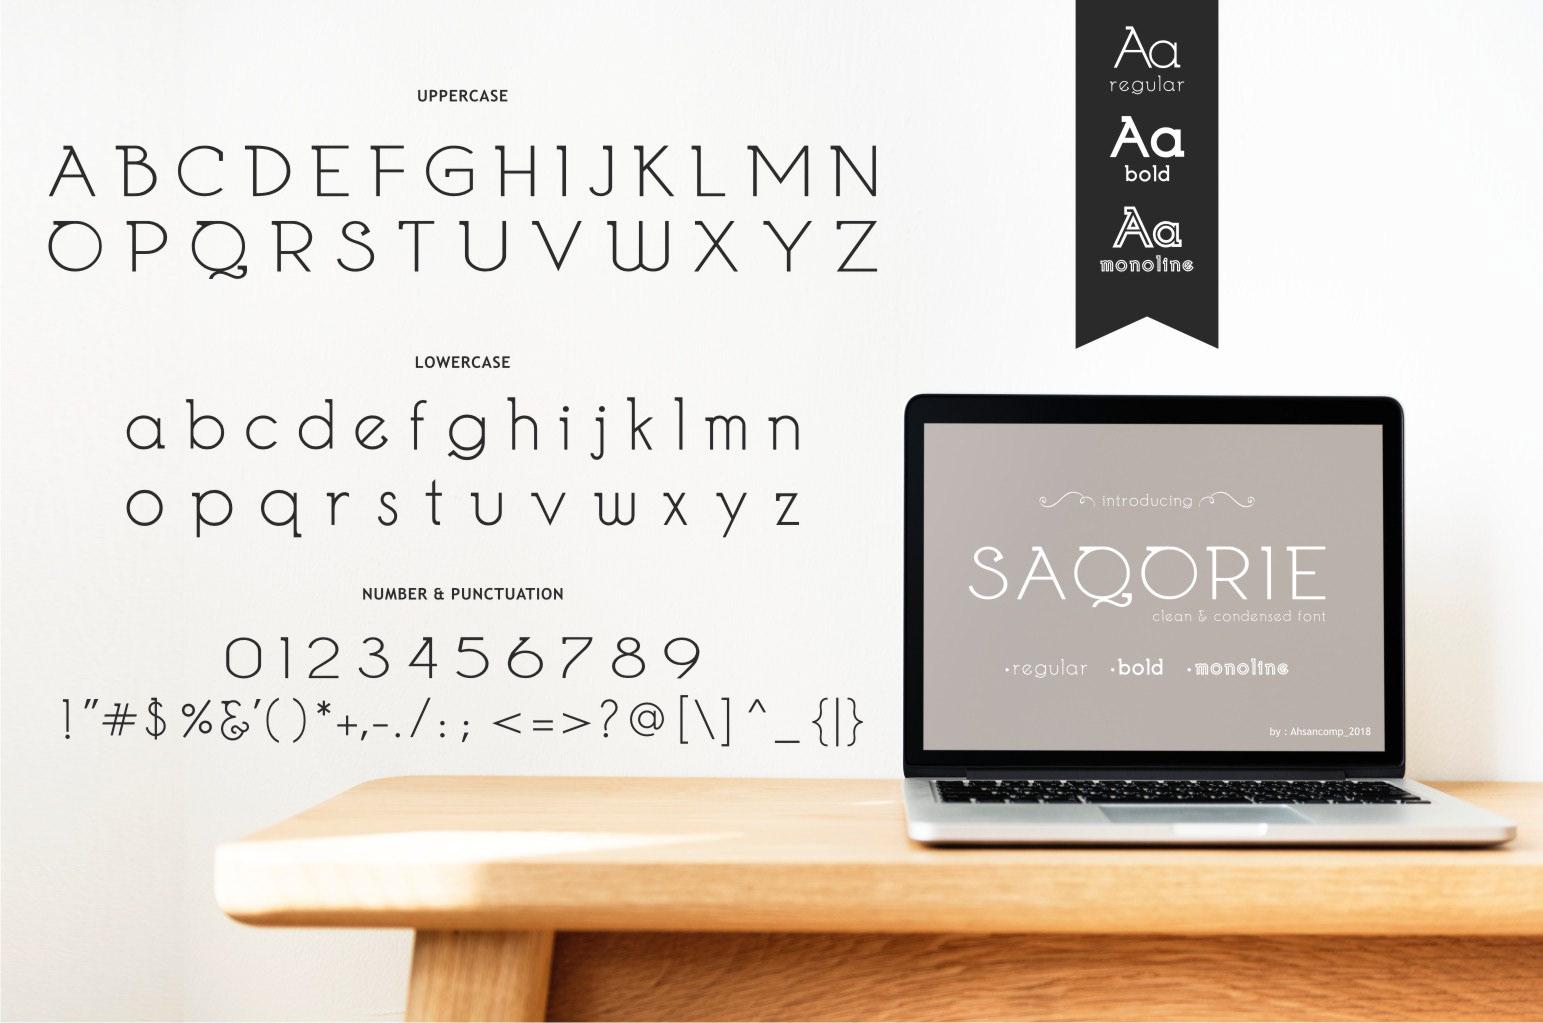 Saqorie Free Font - decorative